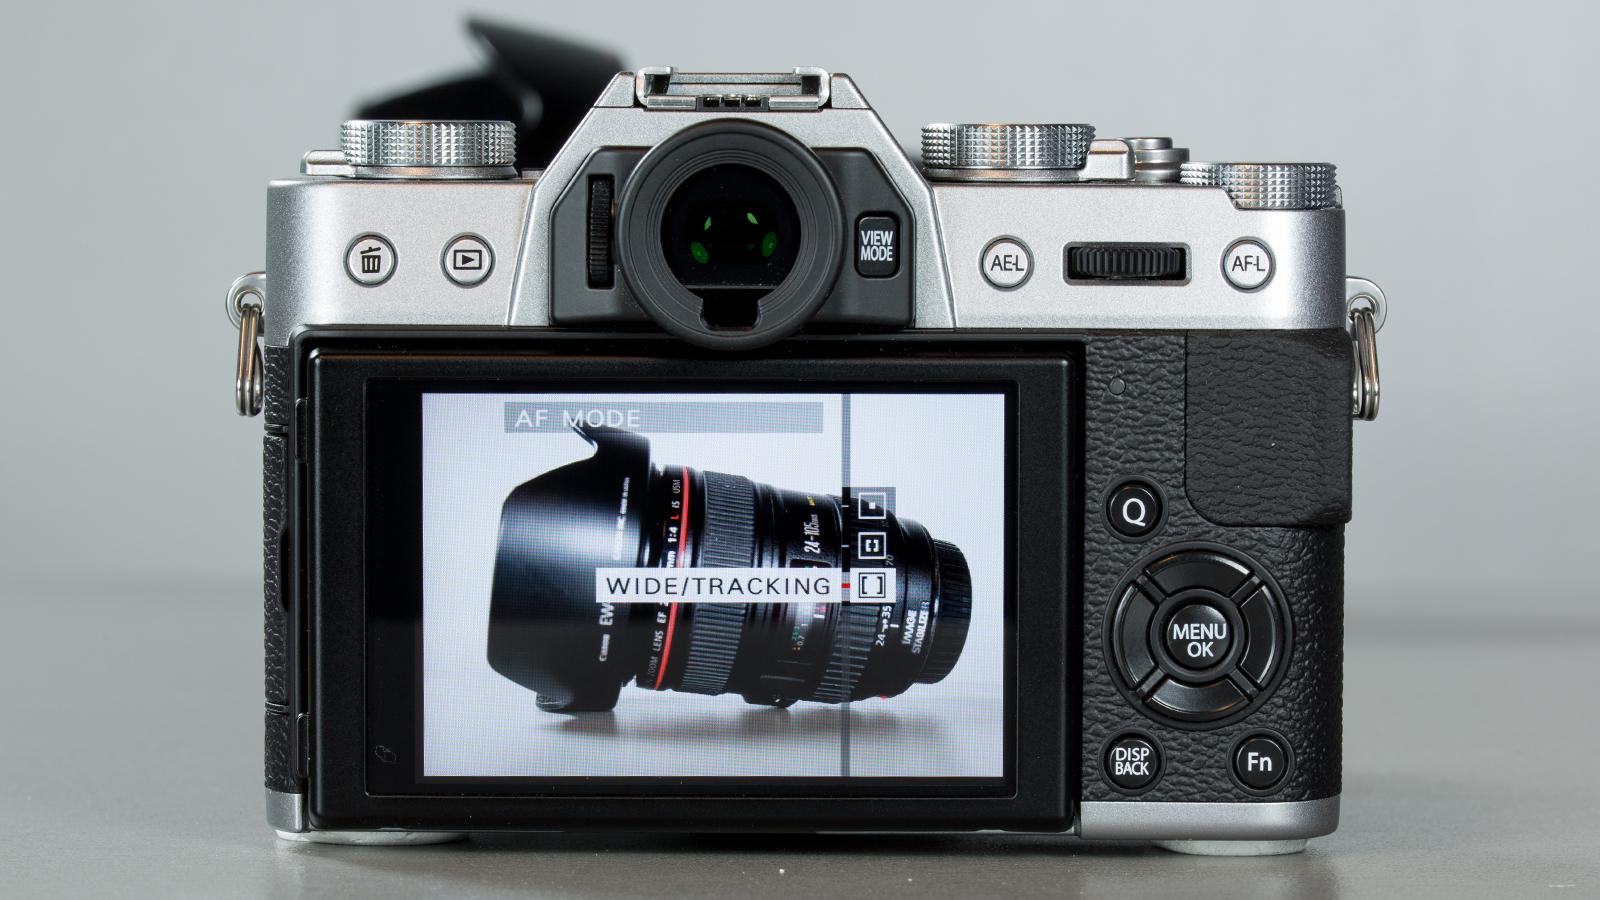 Fujifilm-X-T10-DT-020-AF2